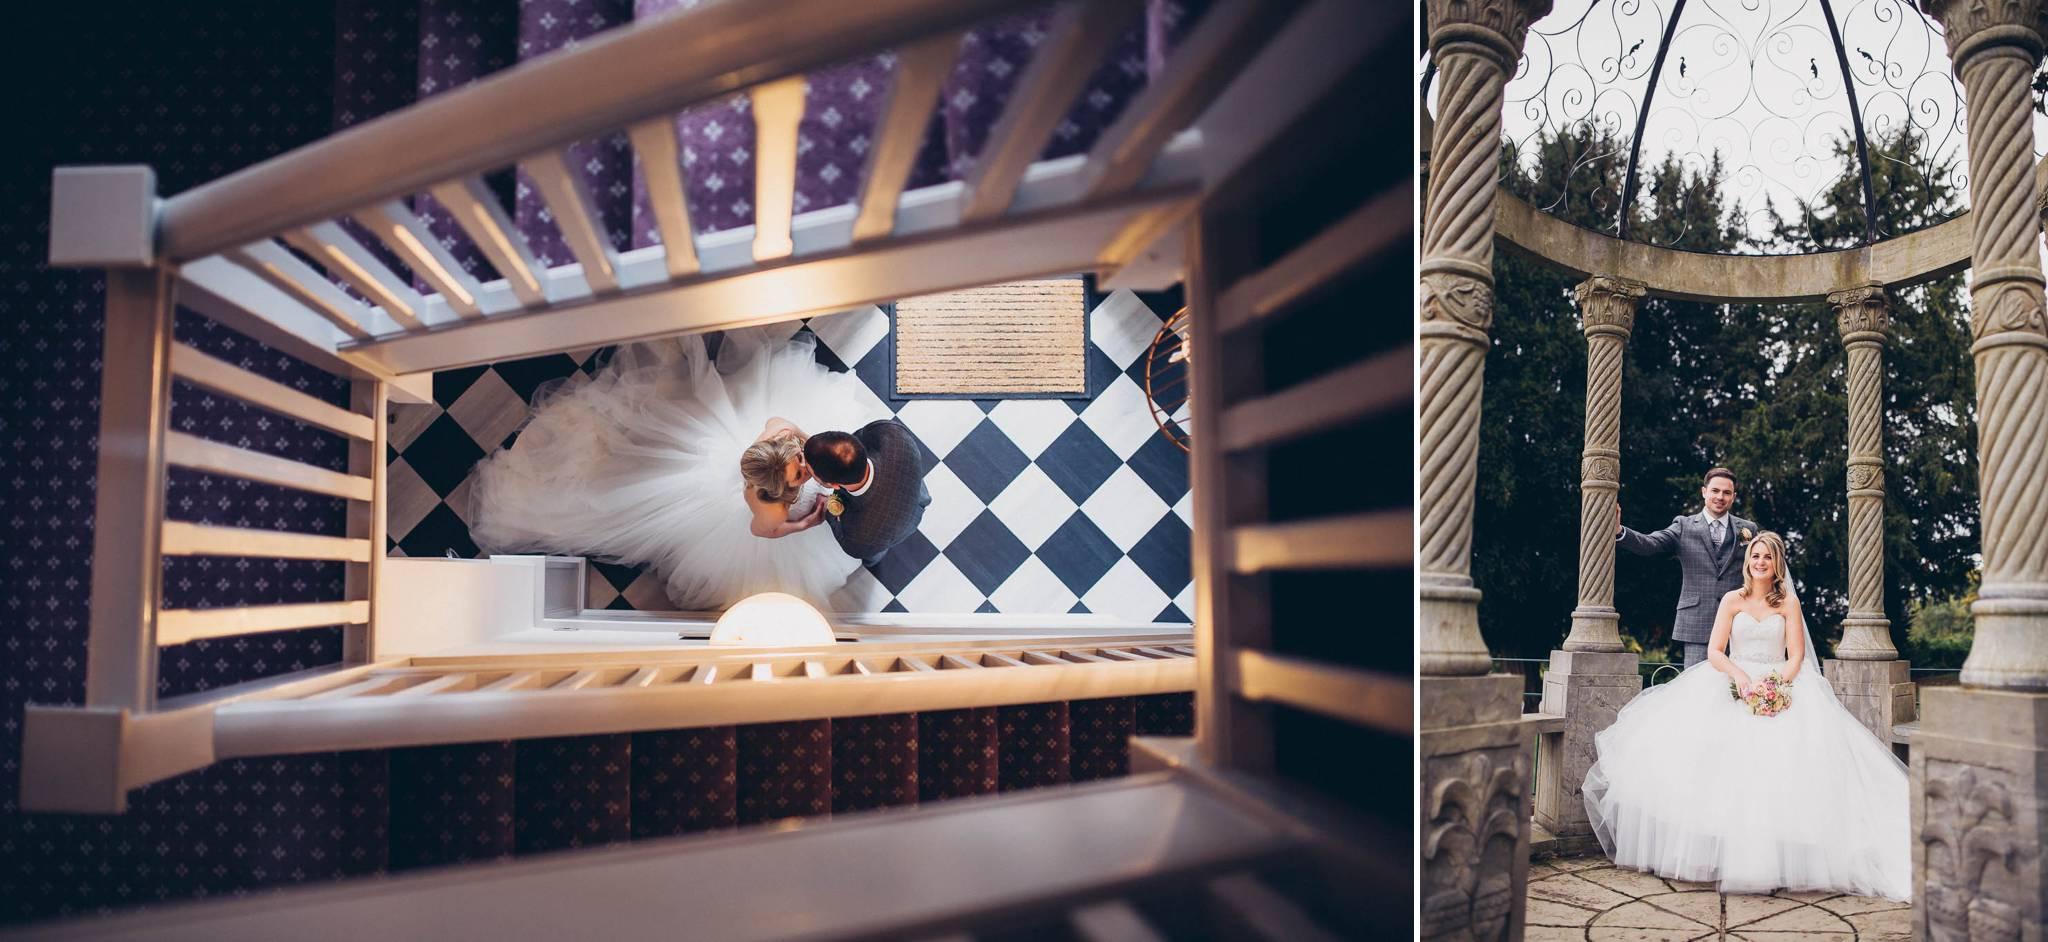 weston-hall-wedding-photographer 12.jpg